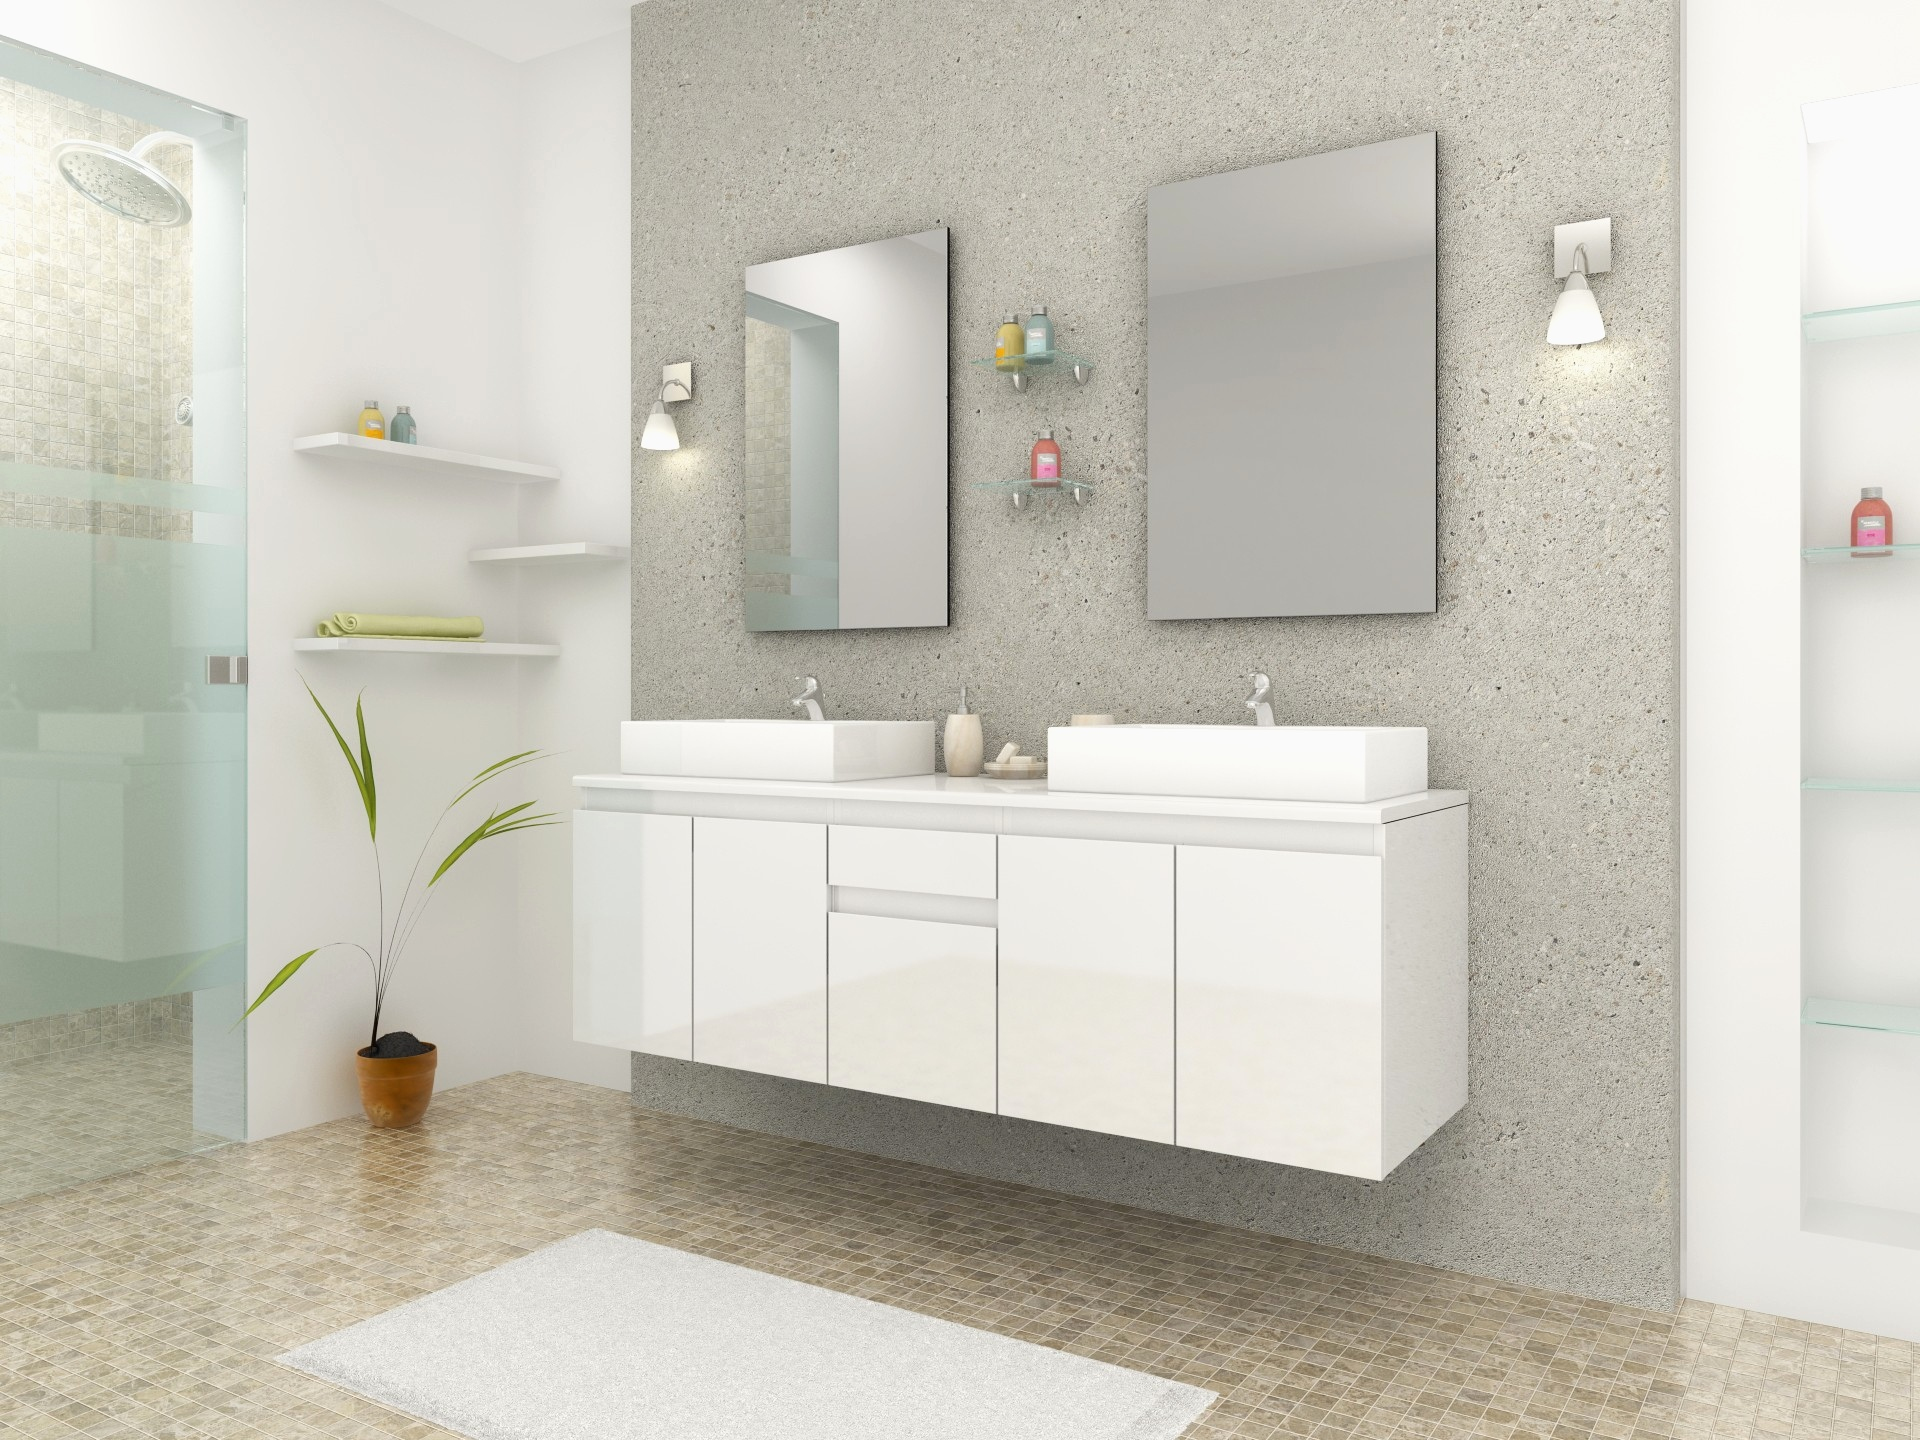 Vasque à Poser Ikea Beau Collection Article with Tag Ikea Luminaire Salle De Bain